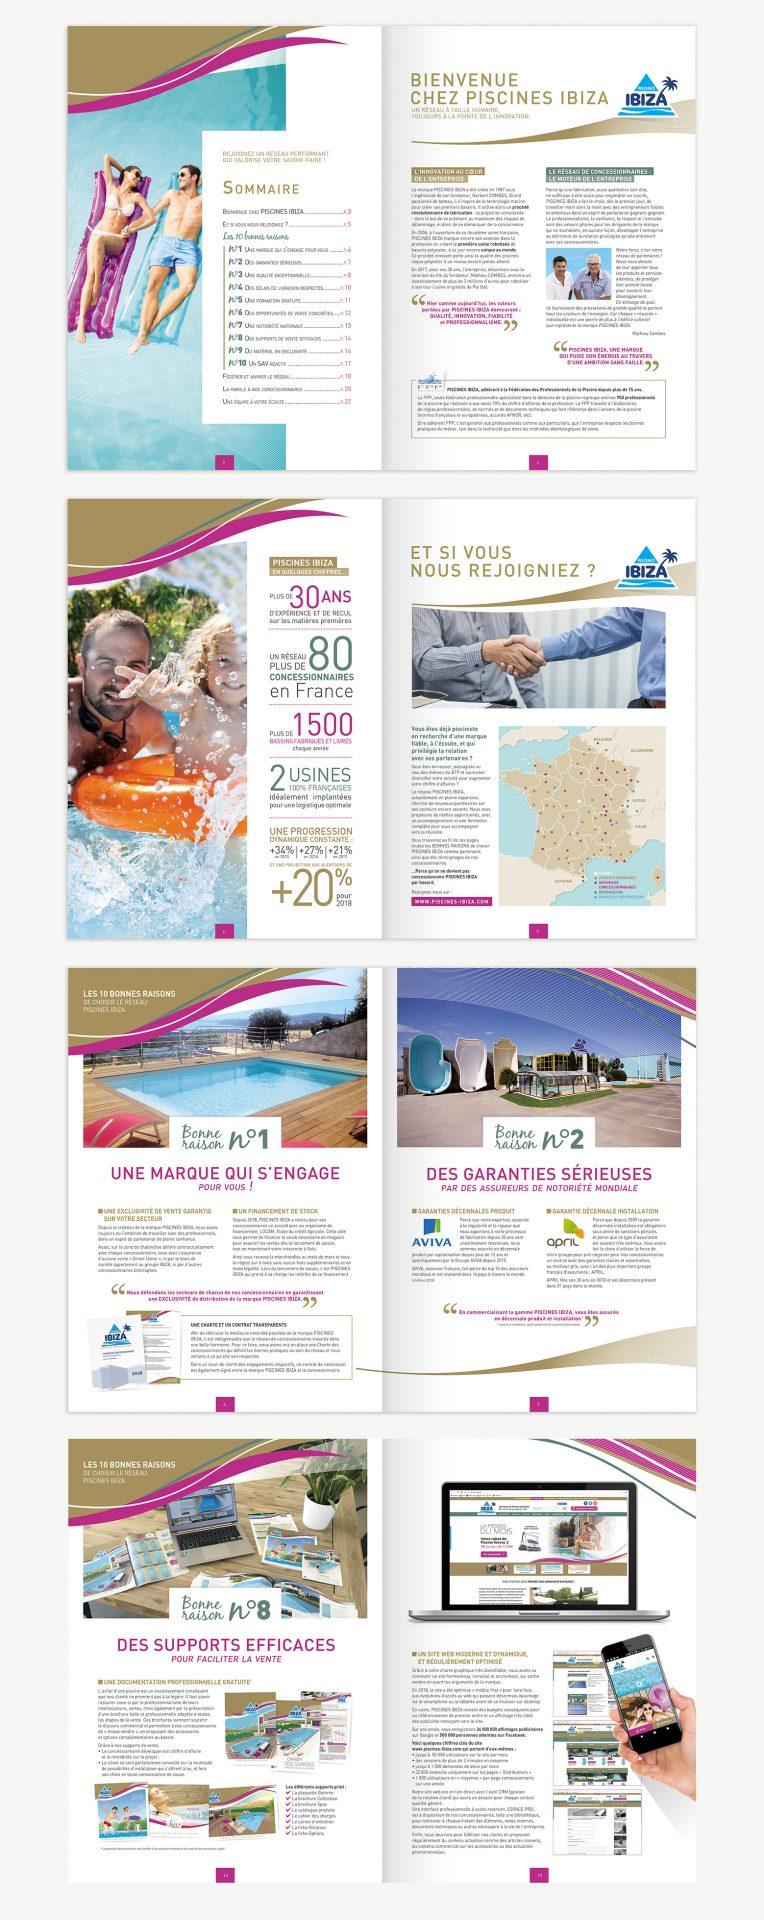 ibiza-brochure-concessionnaires-02.jpg